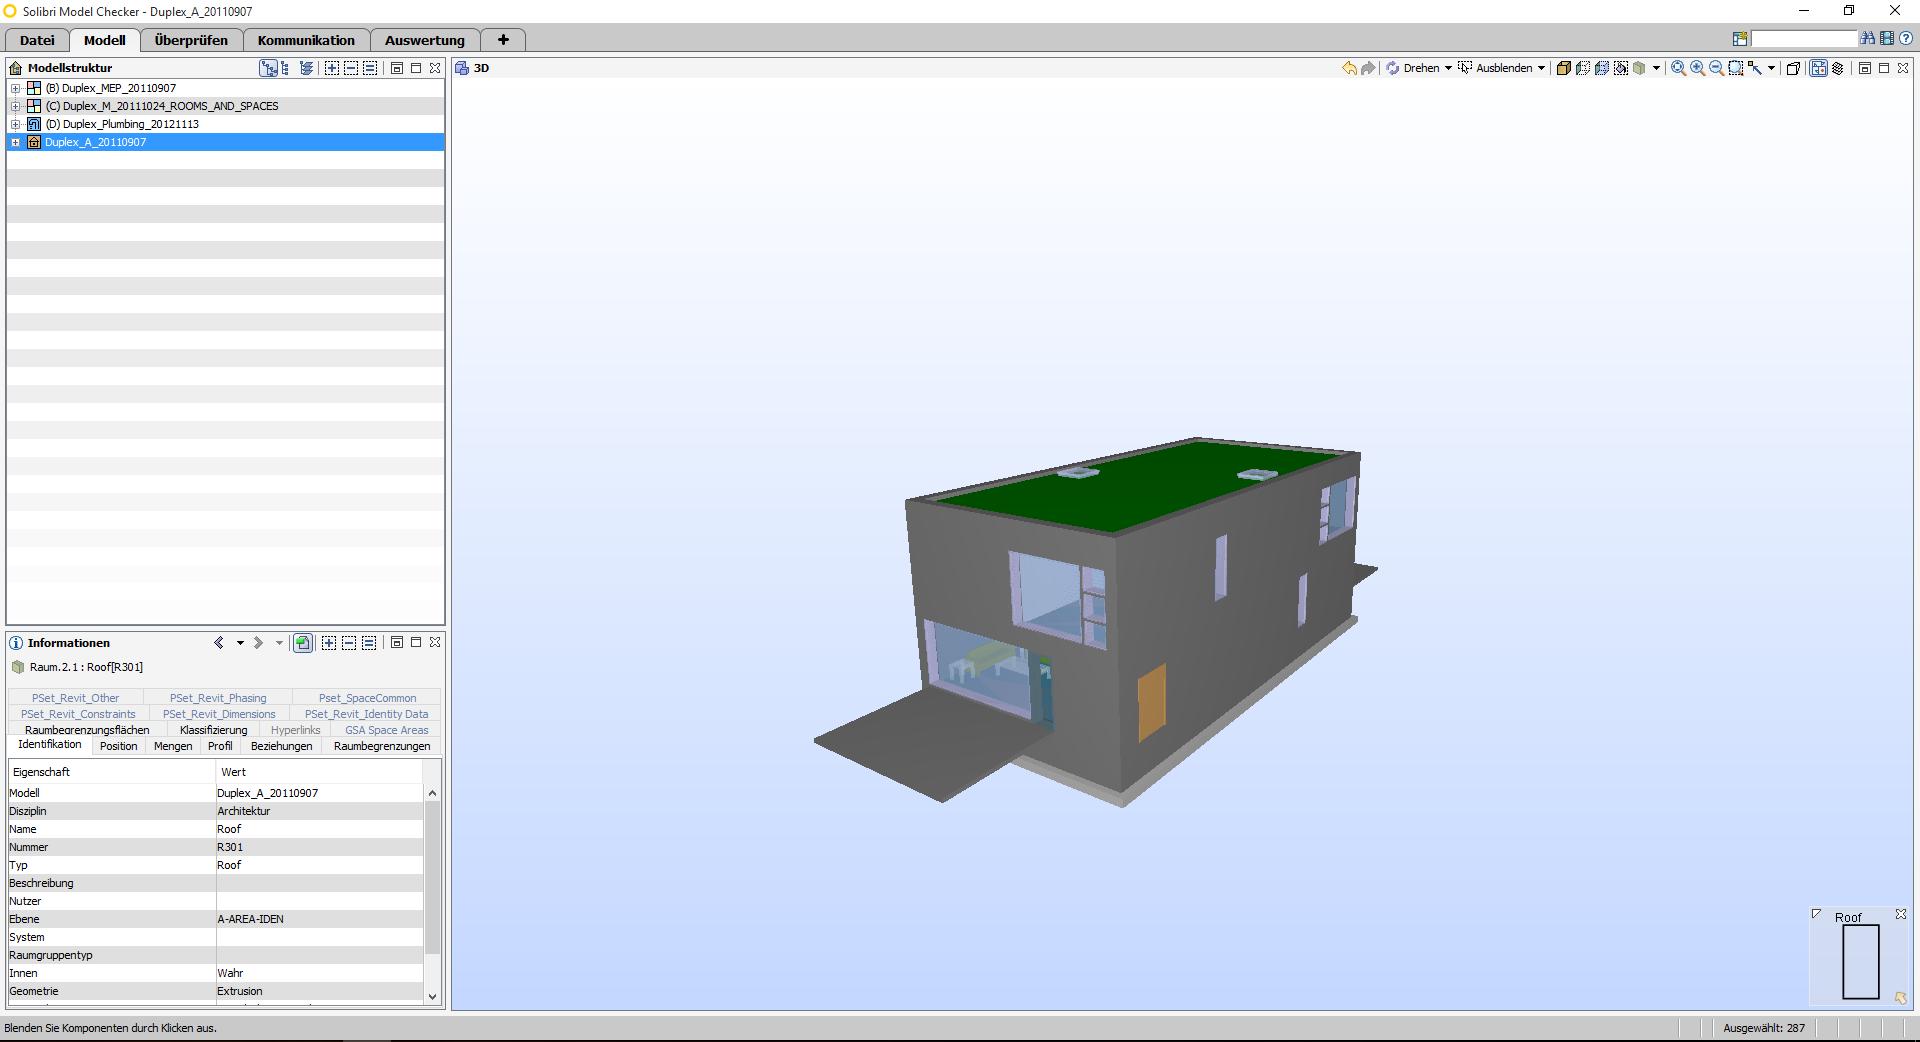 Modell Betrachter / Model Viewer für BIM-Modelle